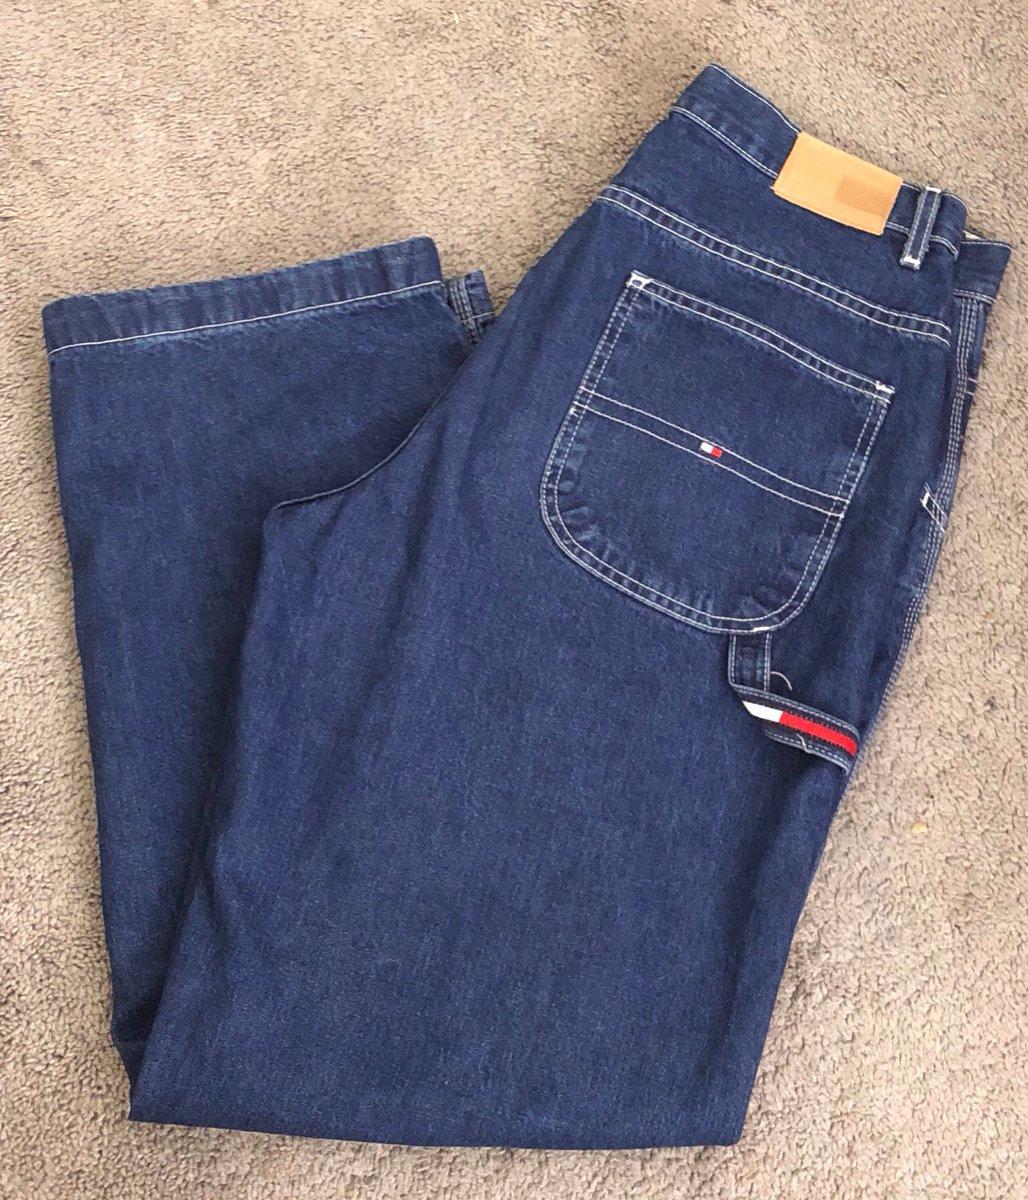 58c356749 ... Vintage 90s Sz12 Womens Tommy Hilfiger Baggy Carpenter Jeans; Logo  Strap, Leather Label ;Hip-Hop Urban Wear Pants https://etsy.me/2uMulrC # vintage ...